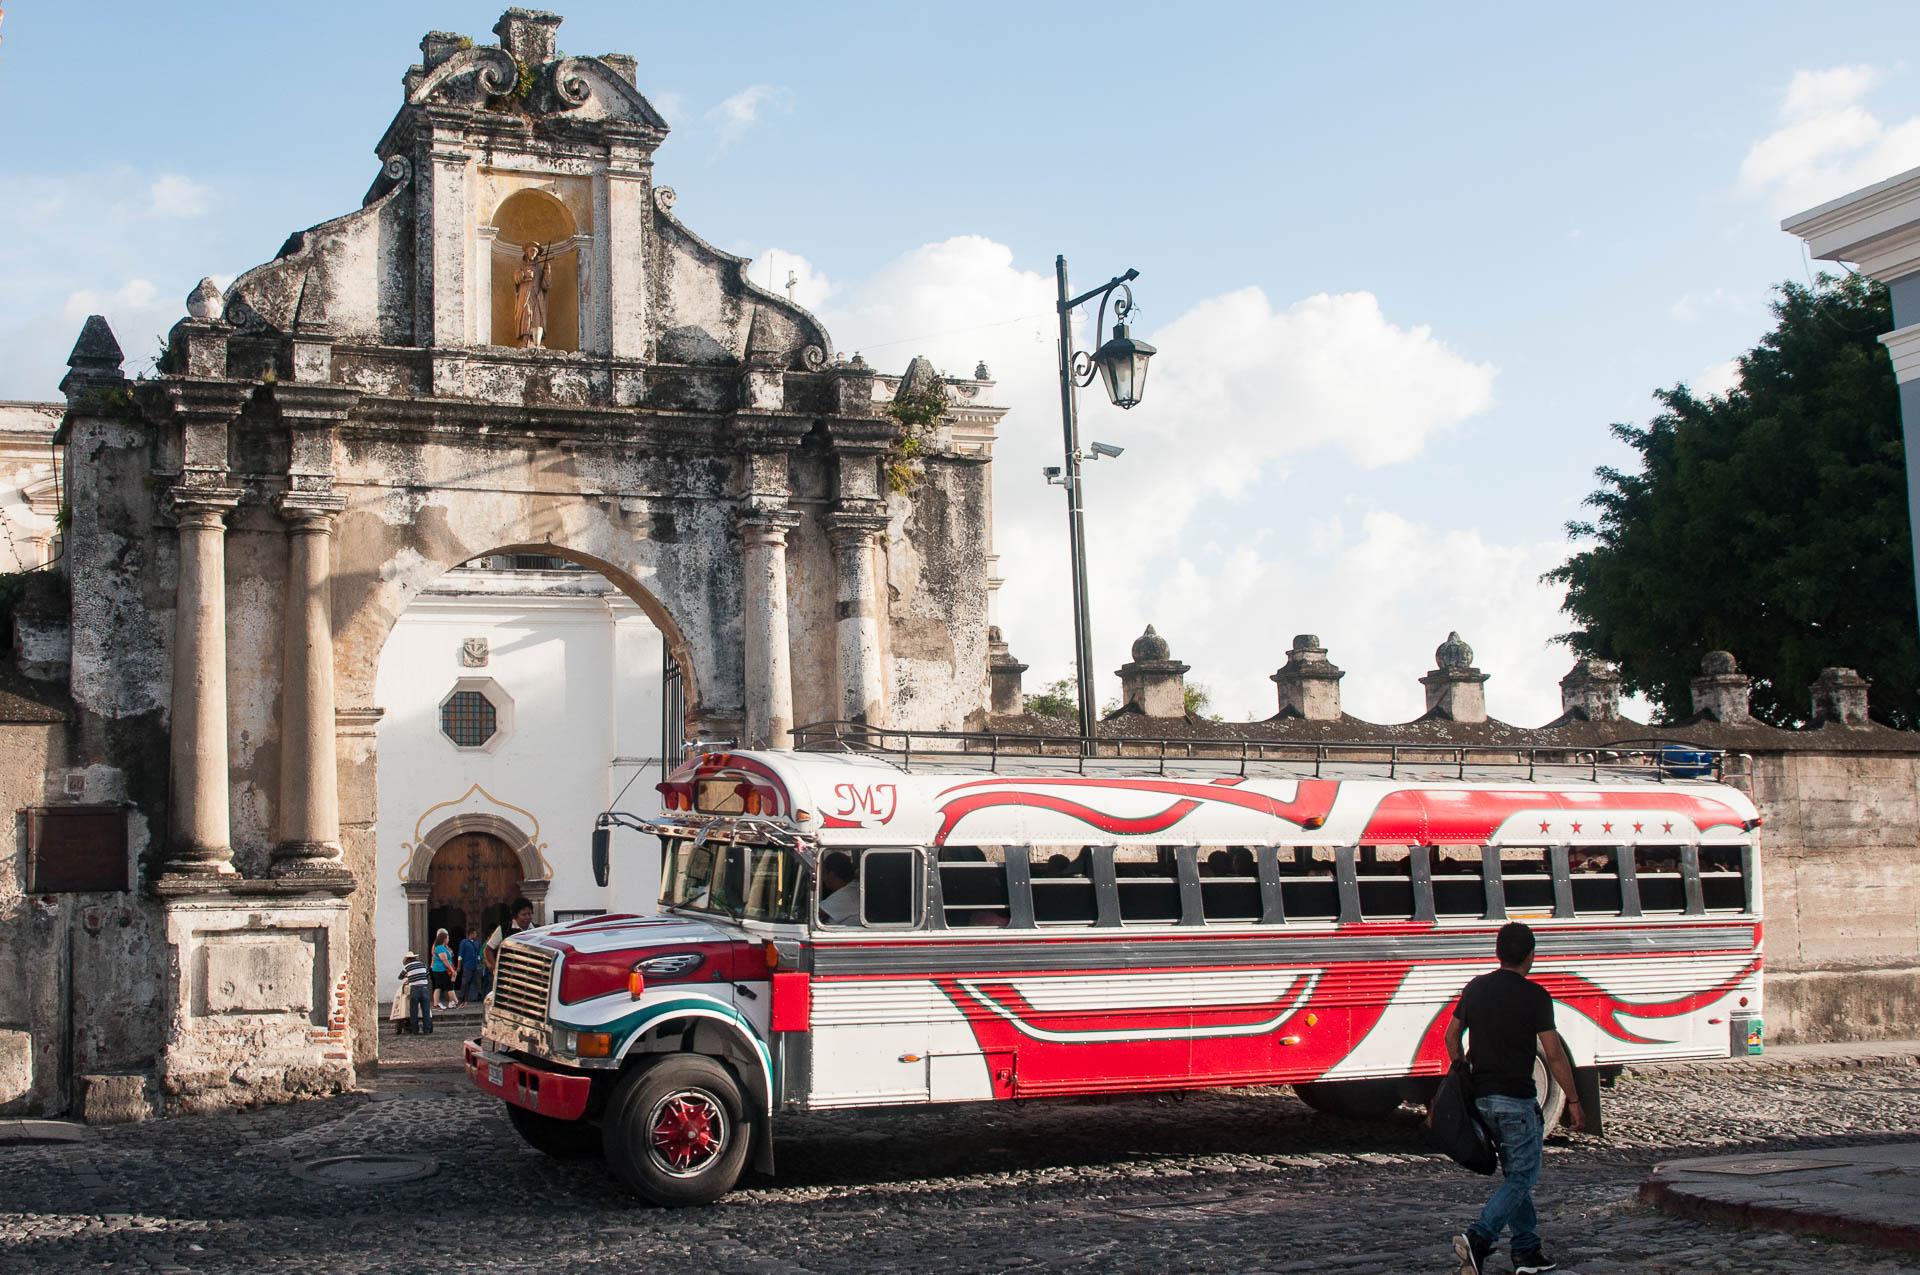 Antigua bus - Les globe blogueurs - blog voyage nature